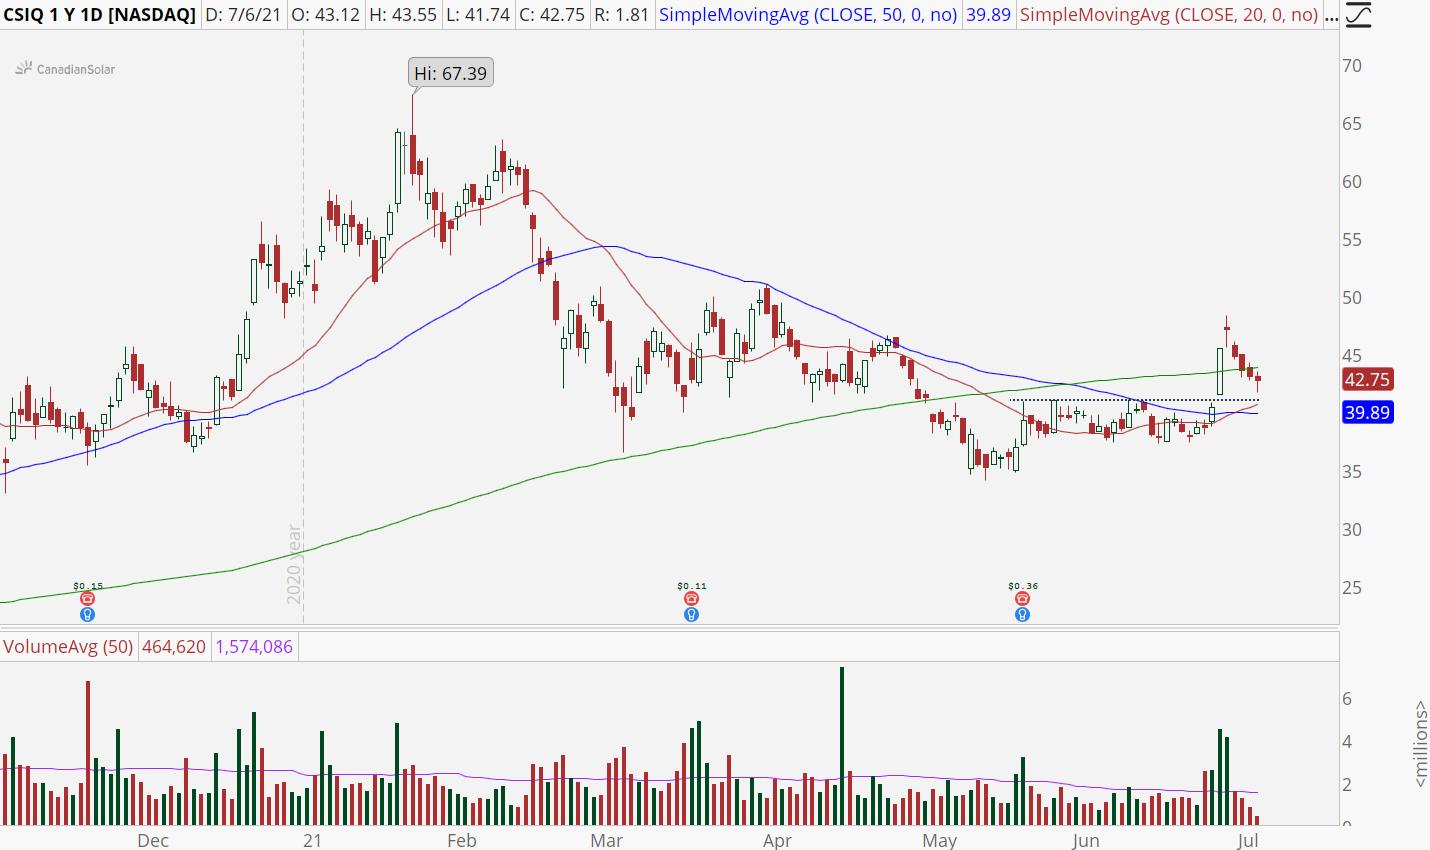 Canadian Solar (CSIQ) stock with bull retracement